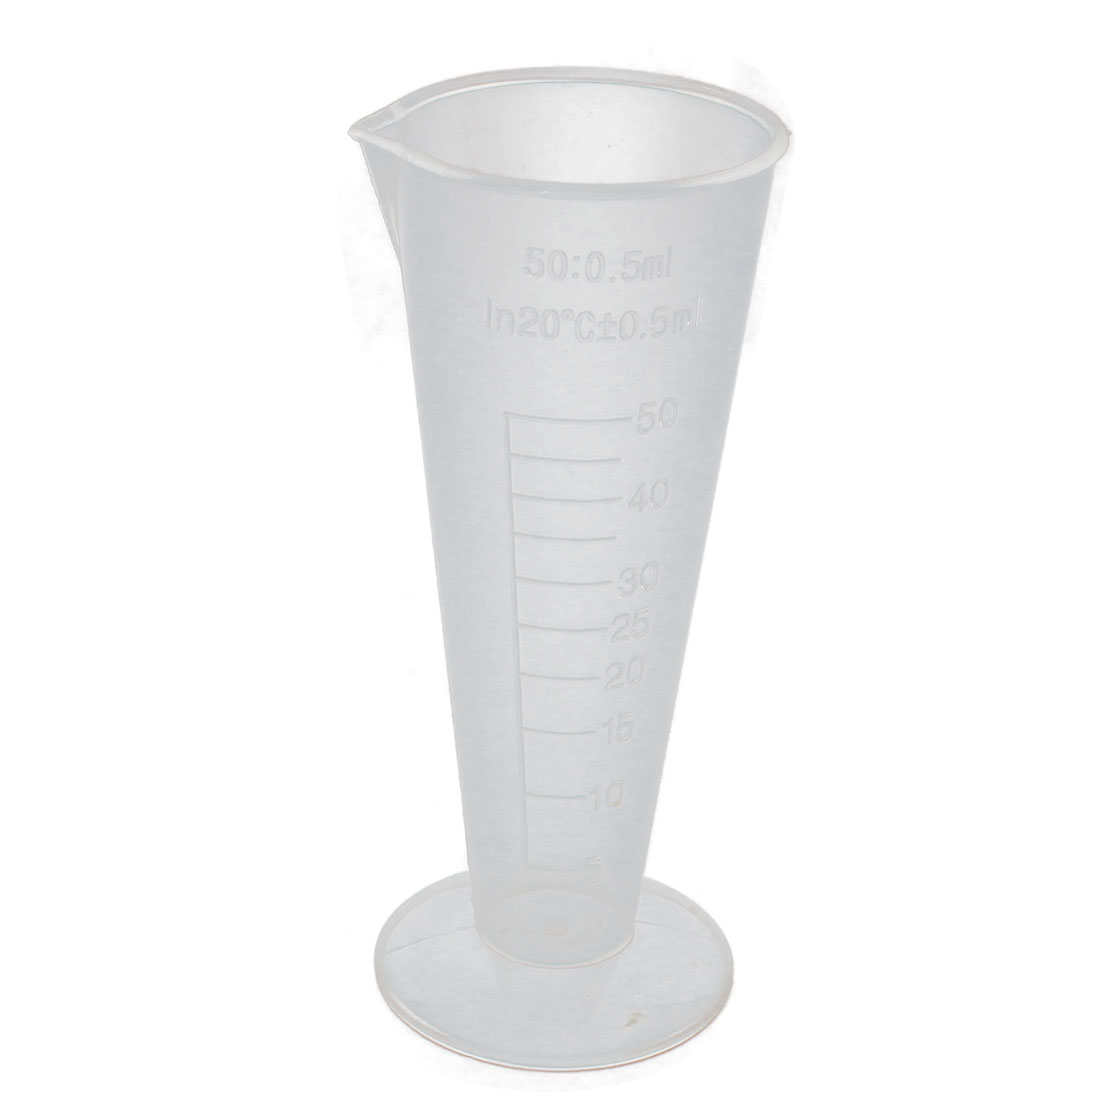 Laboratory Clear Plastic Conical LiquidGraduated Beaker Measuring Cups 50ml